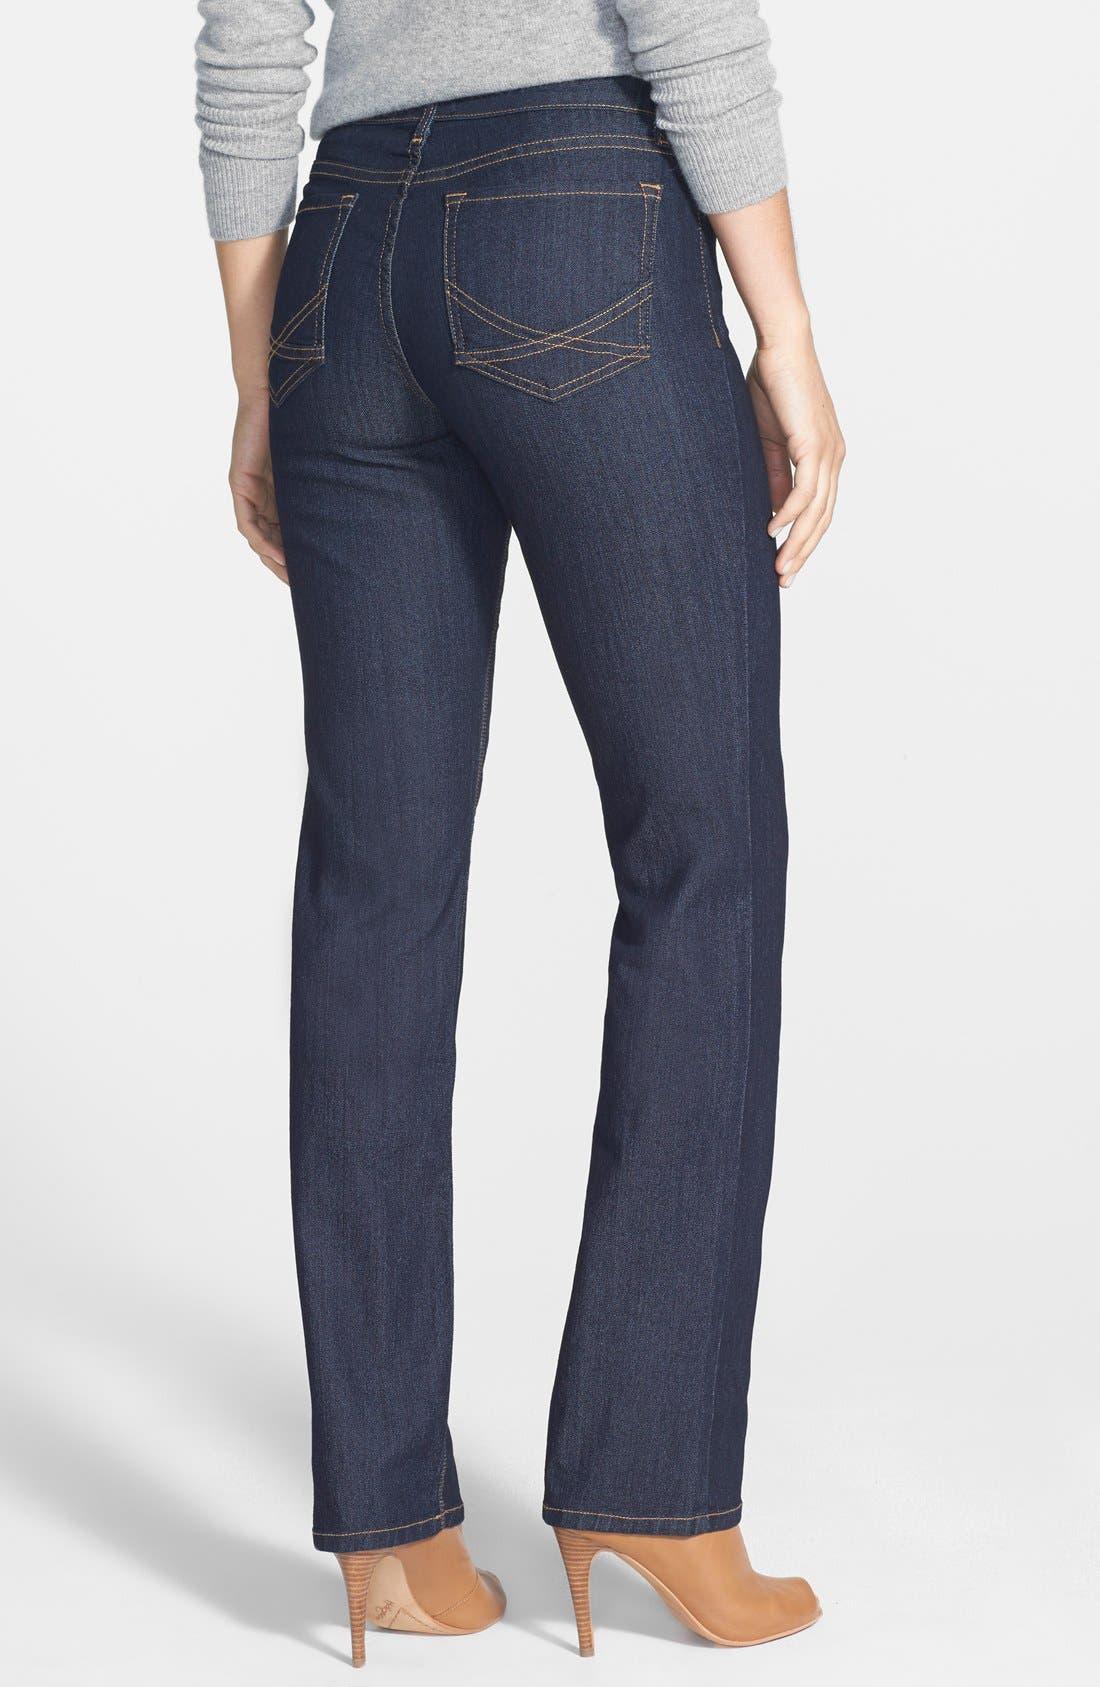 Alternate Image 2  - NYDJ 'Marilyn' Stretch Straight Leg Jeans (Dark Enzyme) (Regular & Petite)